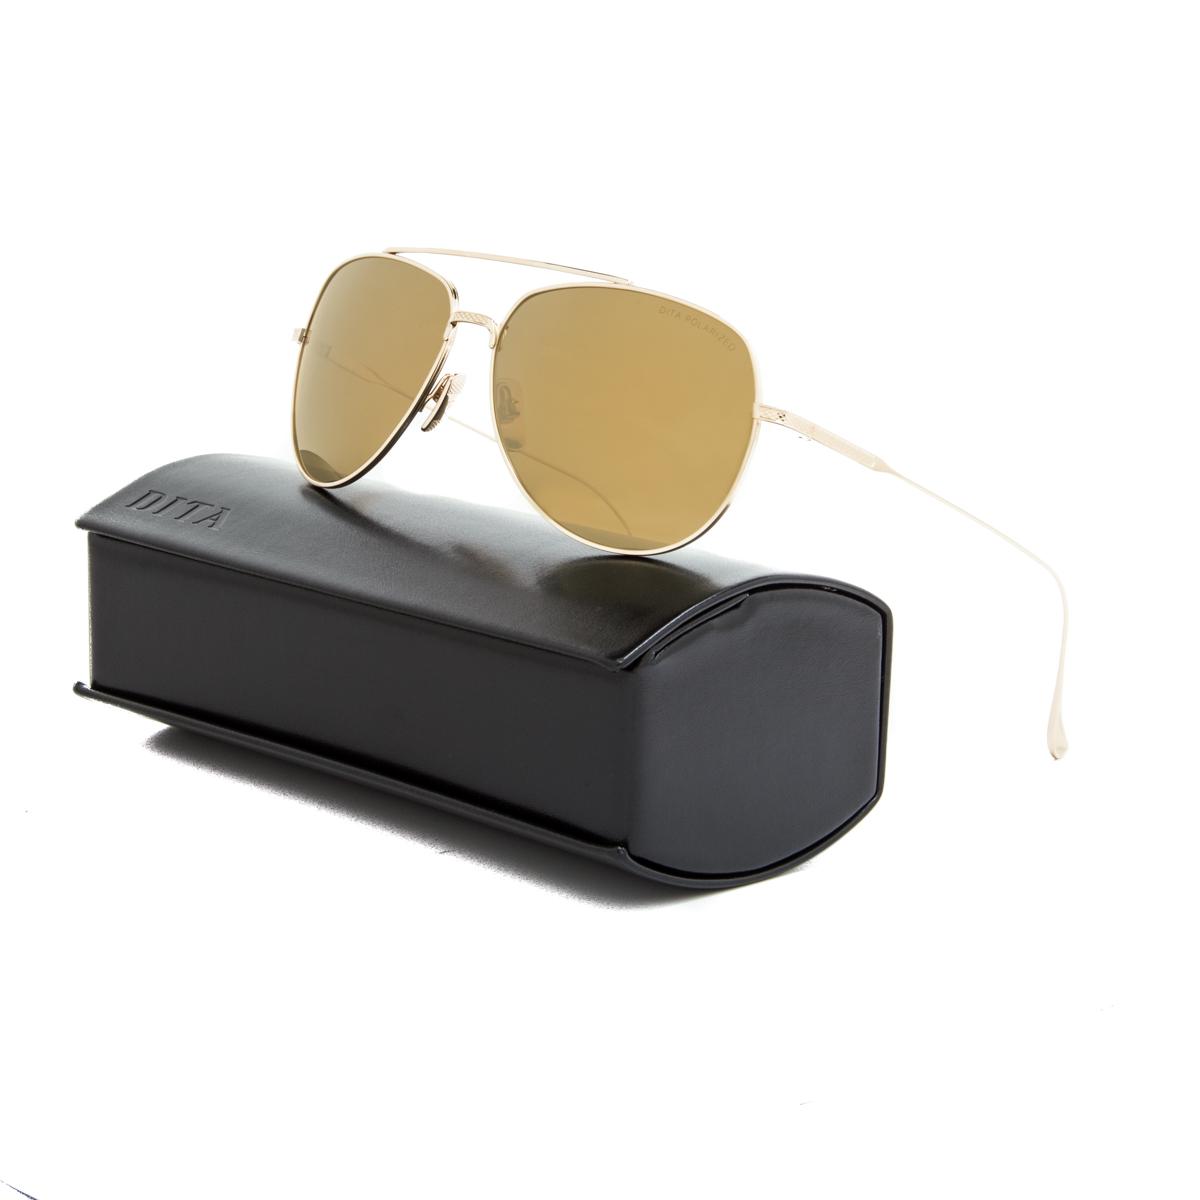 4fa96f2685 Details about Dita Flight 004 Sunglasses 7804 B P 12K Gold   Brown Gold  Flash Polarized AR